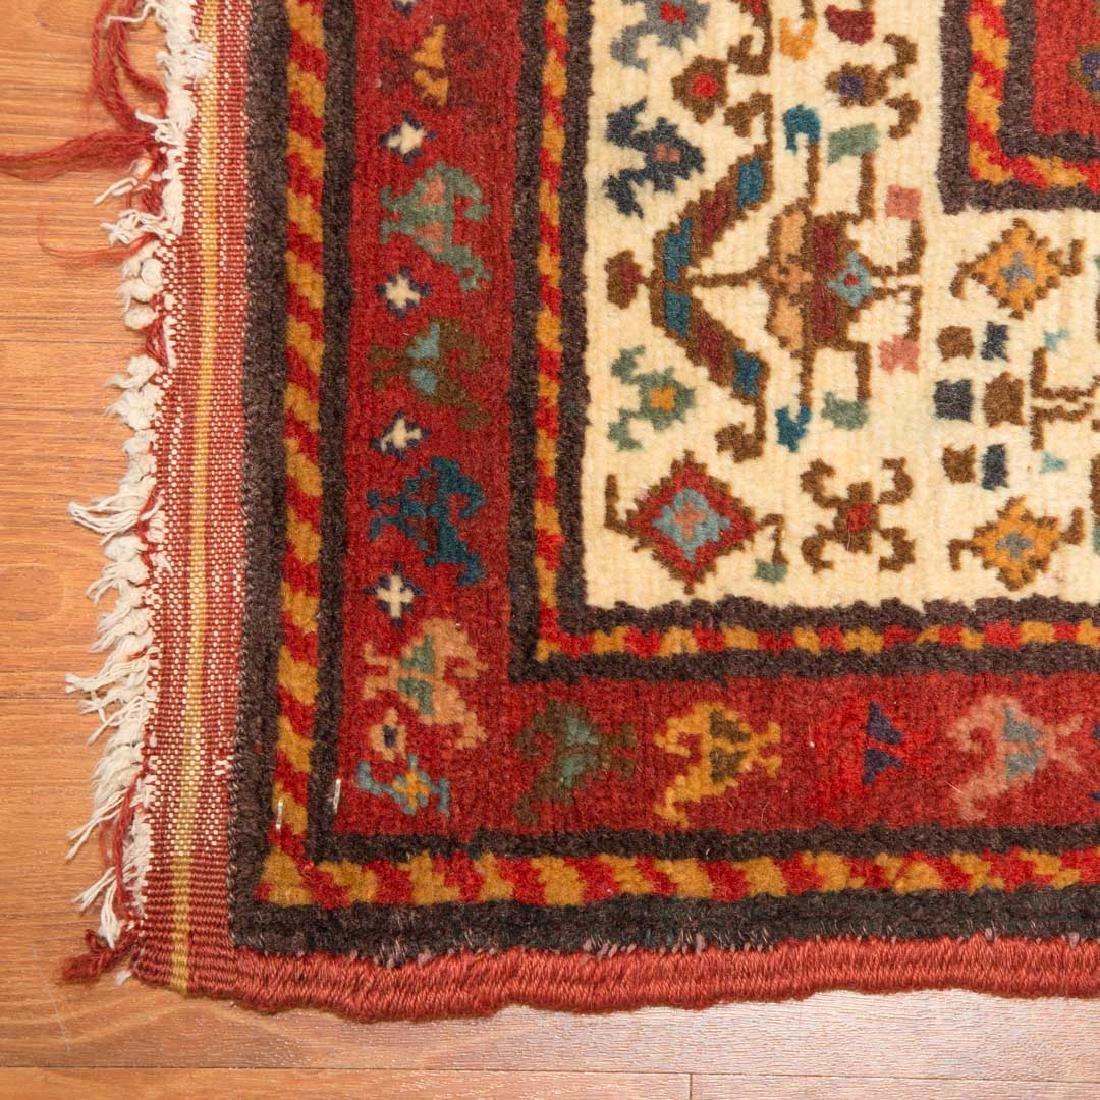 Antique Kazak rug, approx. 3.4 x 8.4 - 2